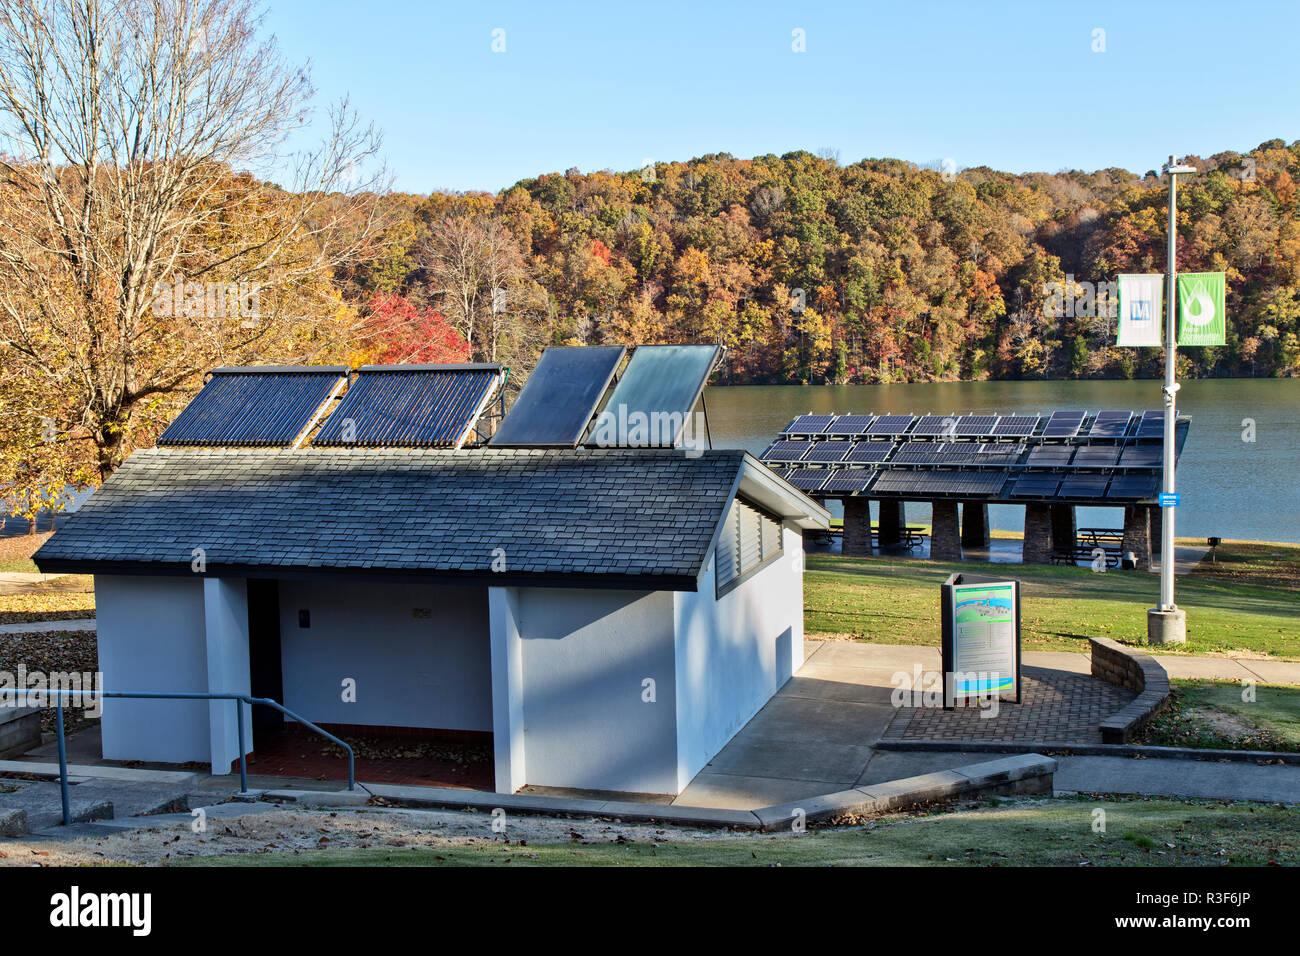 Calentadores solares de agua caliente en el baño, techo con paneles solares, en el fondo, facilitando Melton Hill Dam Recreation Area camping. Imagen De Stock